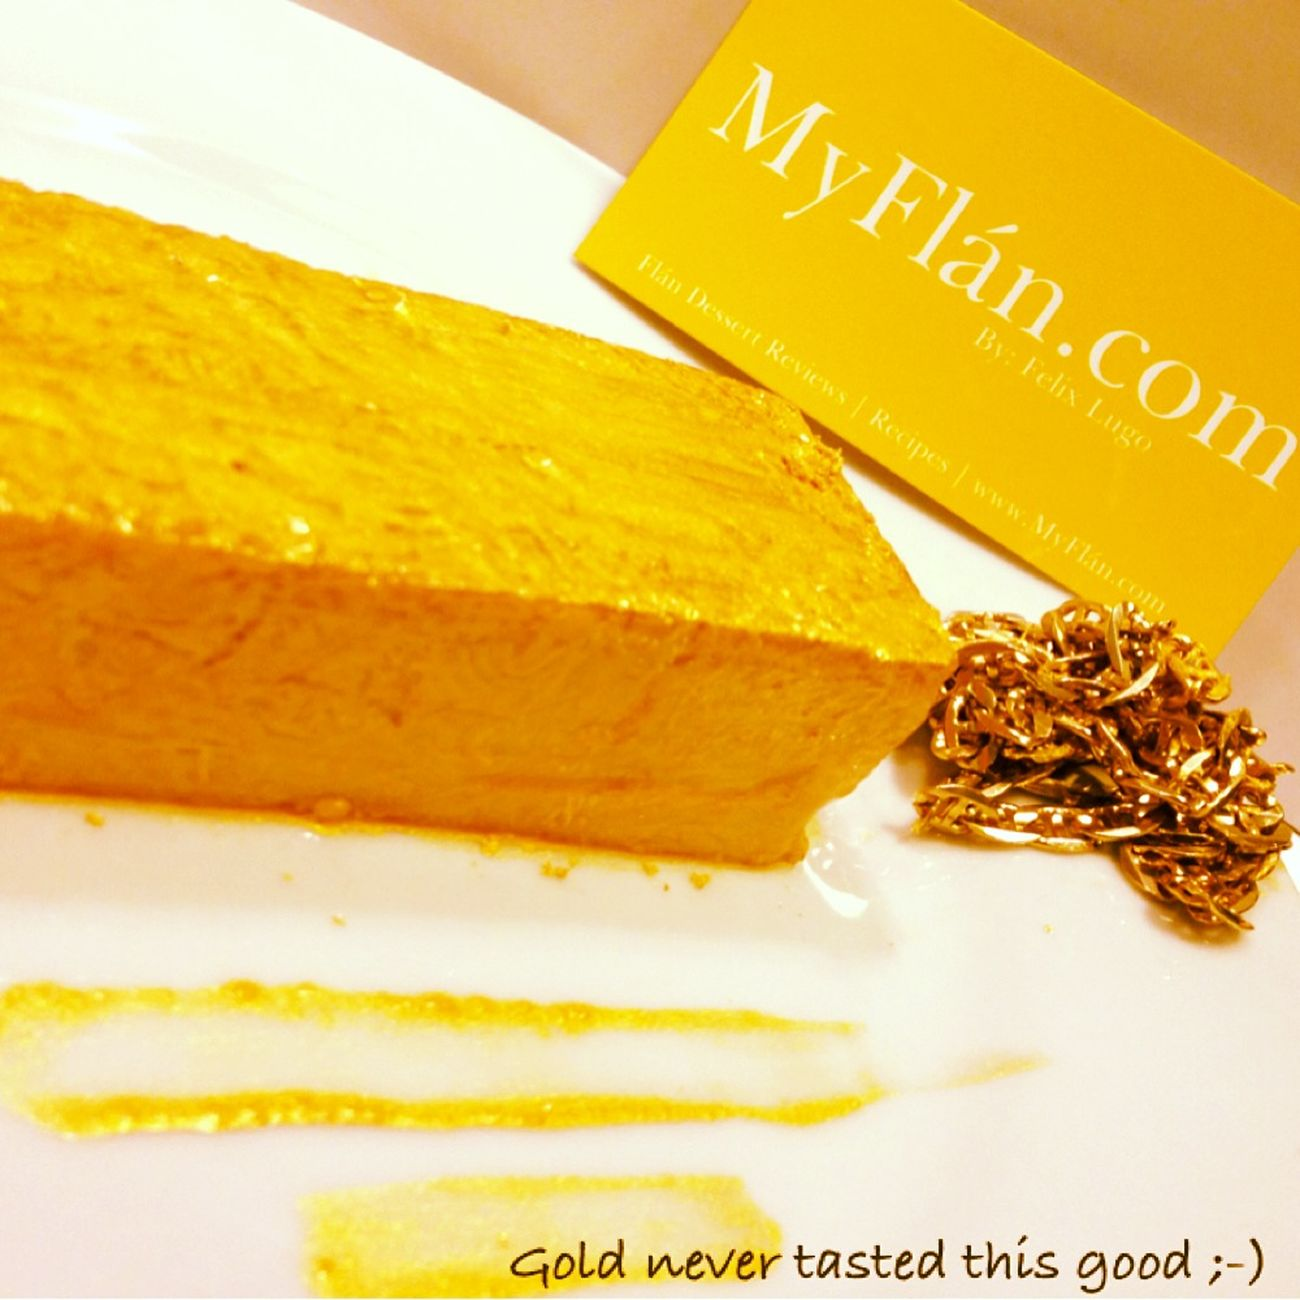 Desserts Flan Dessert Foodporn Gold Myflan Bakery Pudim